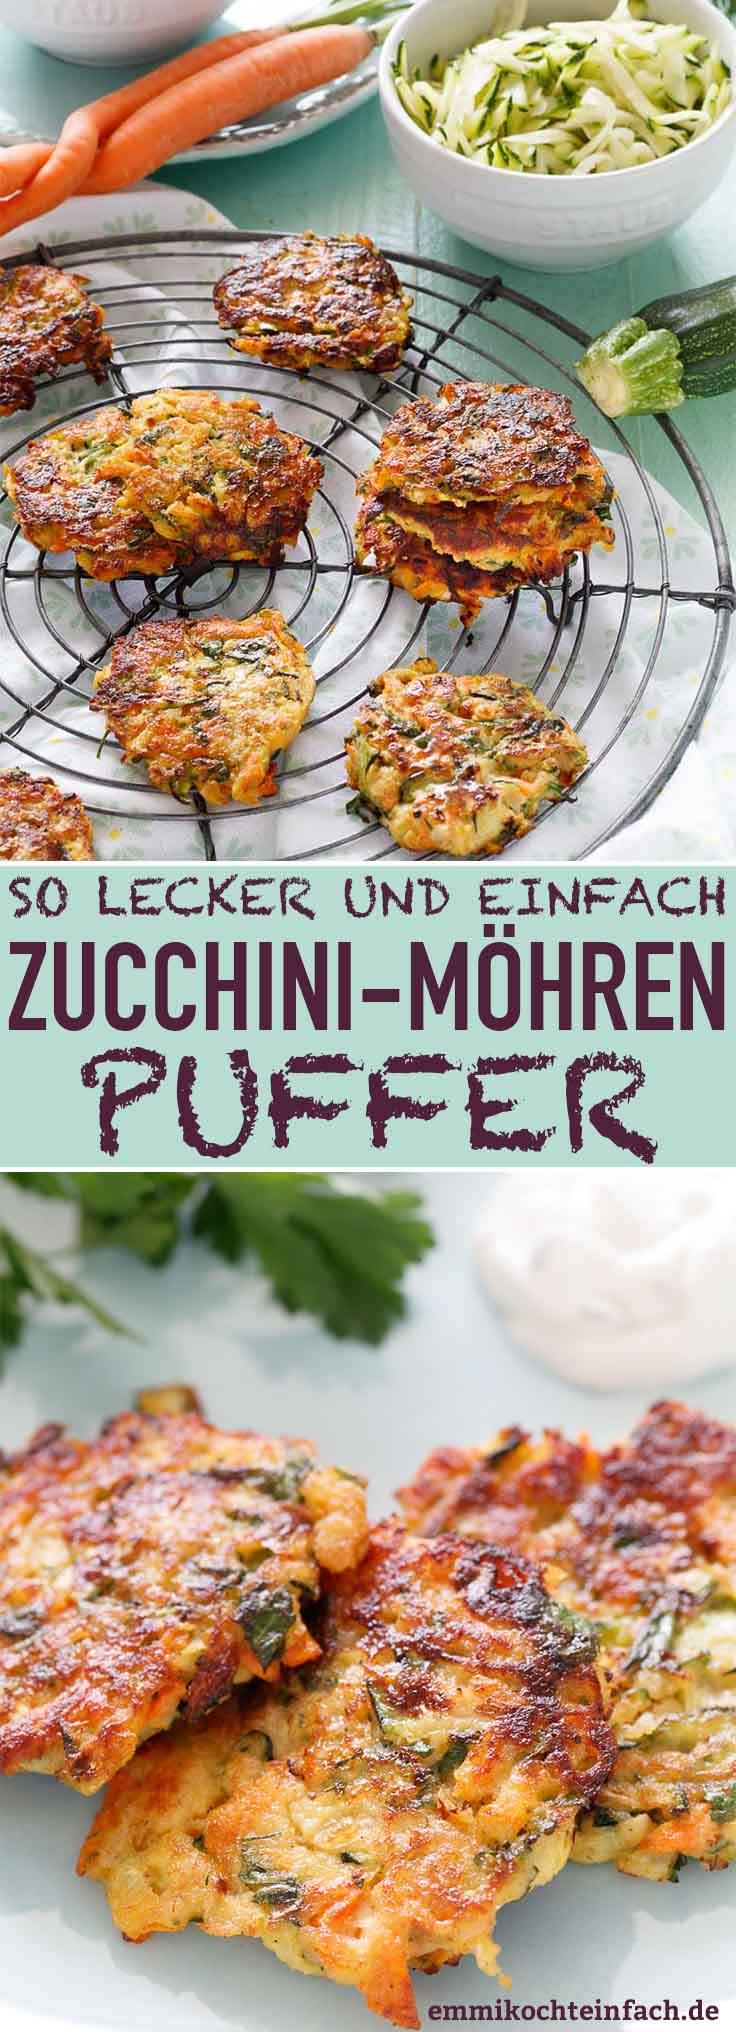 Zucchini Möhren Puffer - www.emmikochteinfach.de